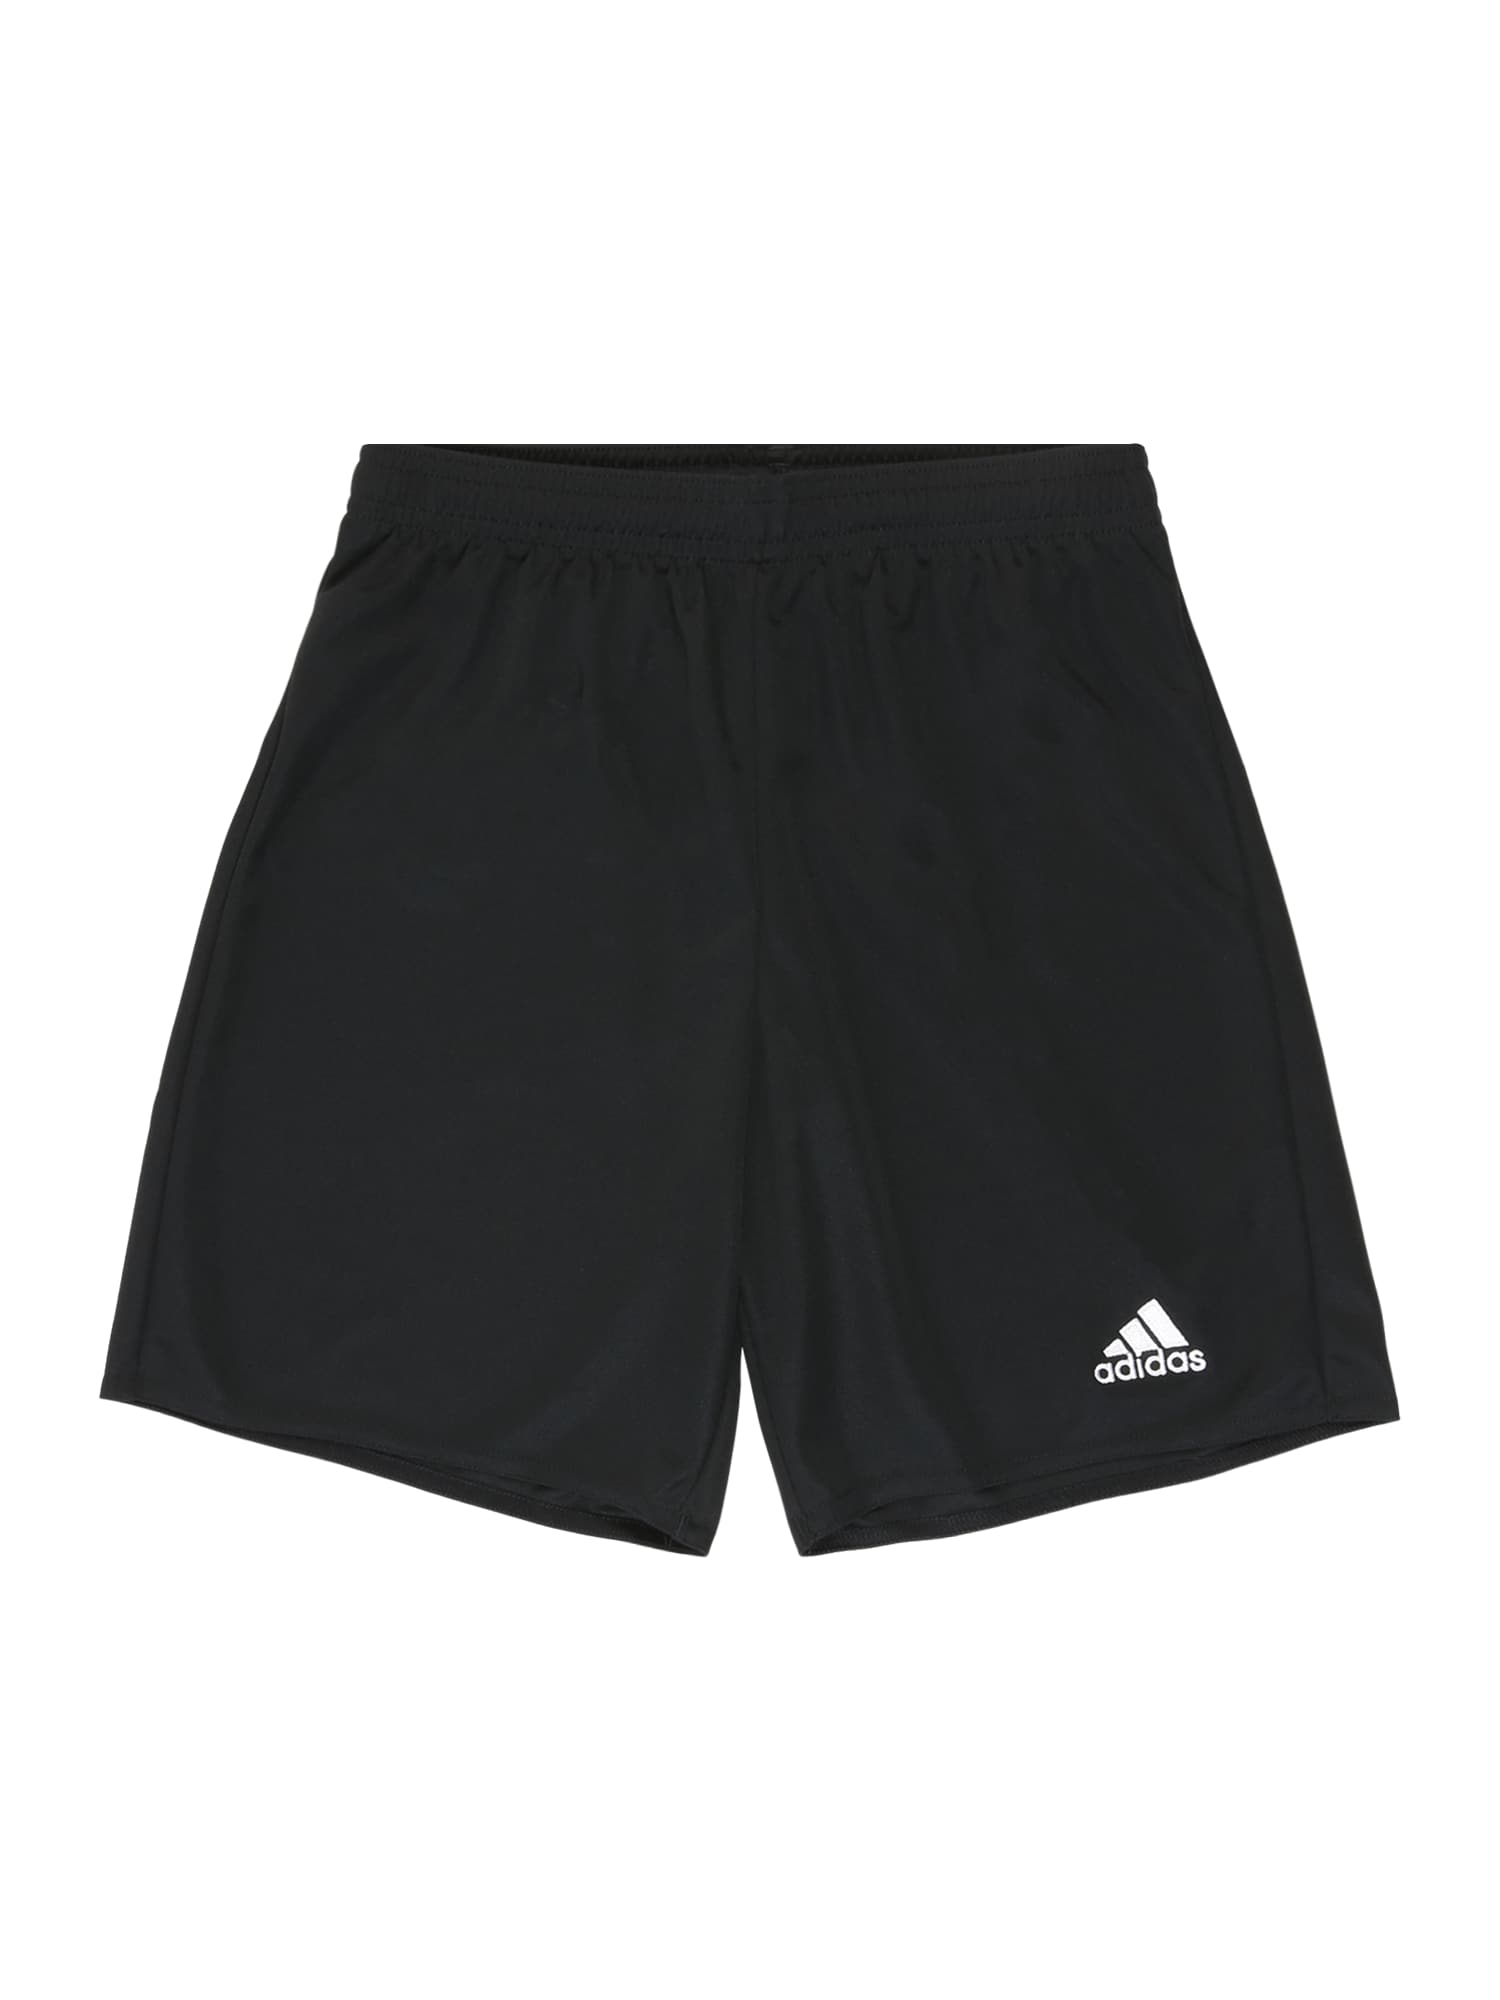 ADIDAS PERFORMANCE Športové nohavice 'PARMA 16'  biela / čierna